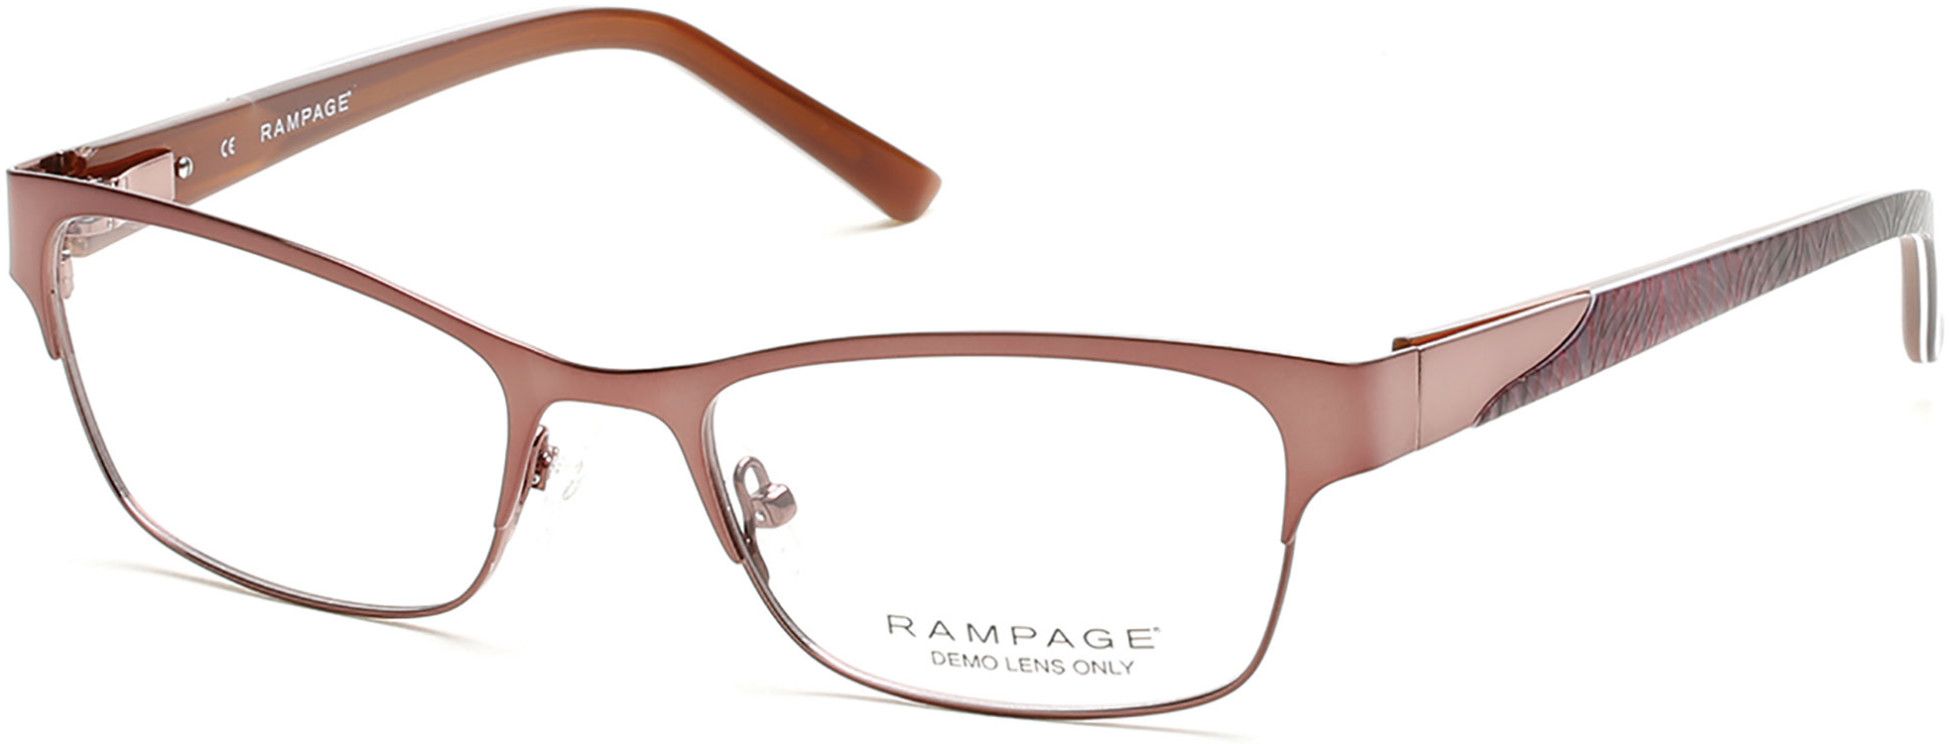 RAMPAGE RA0194 style-color 048 - Shiny Dark Brown